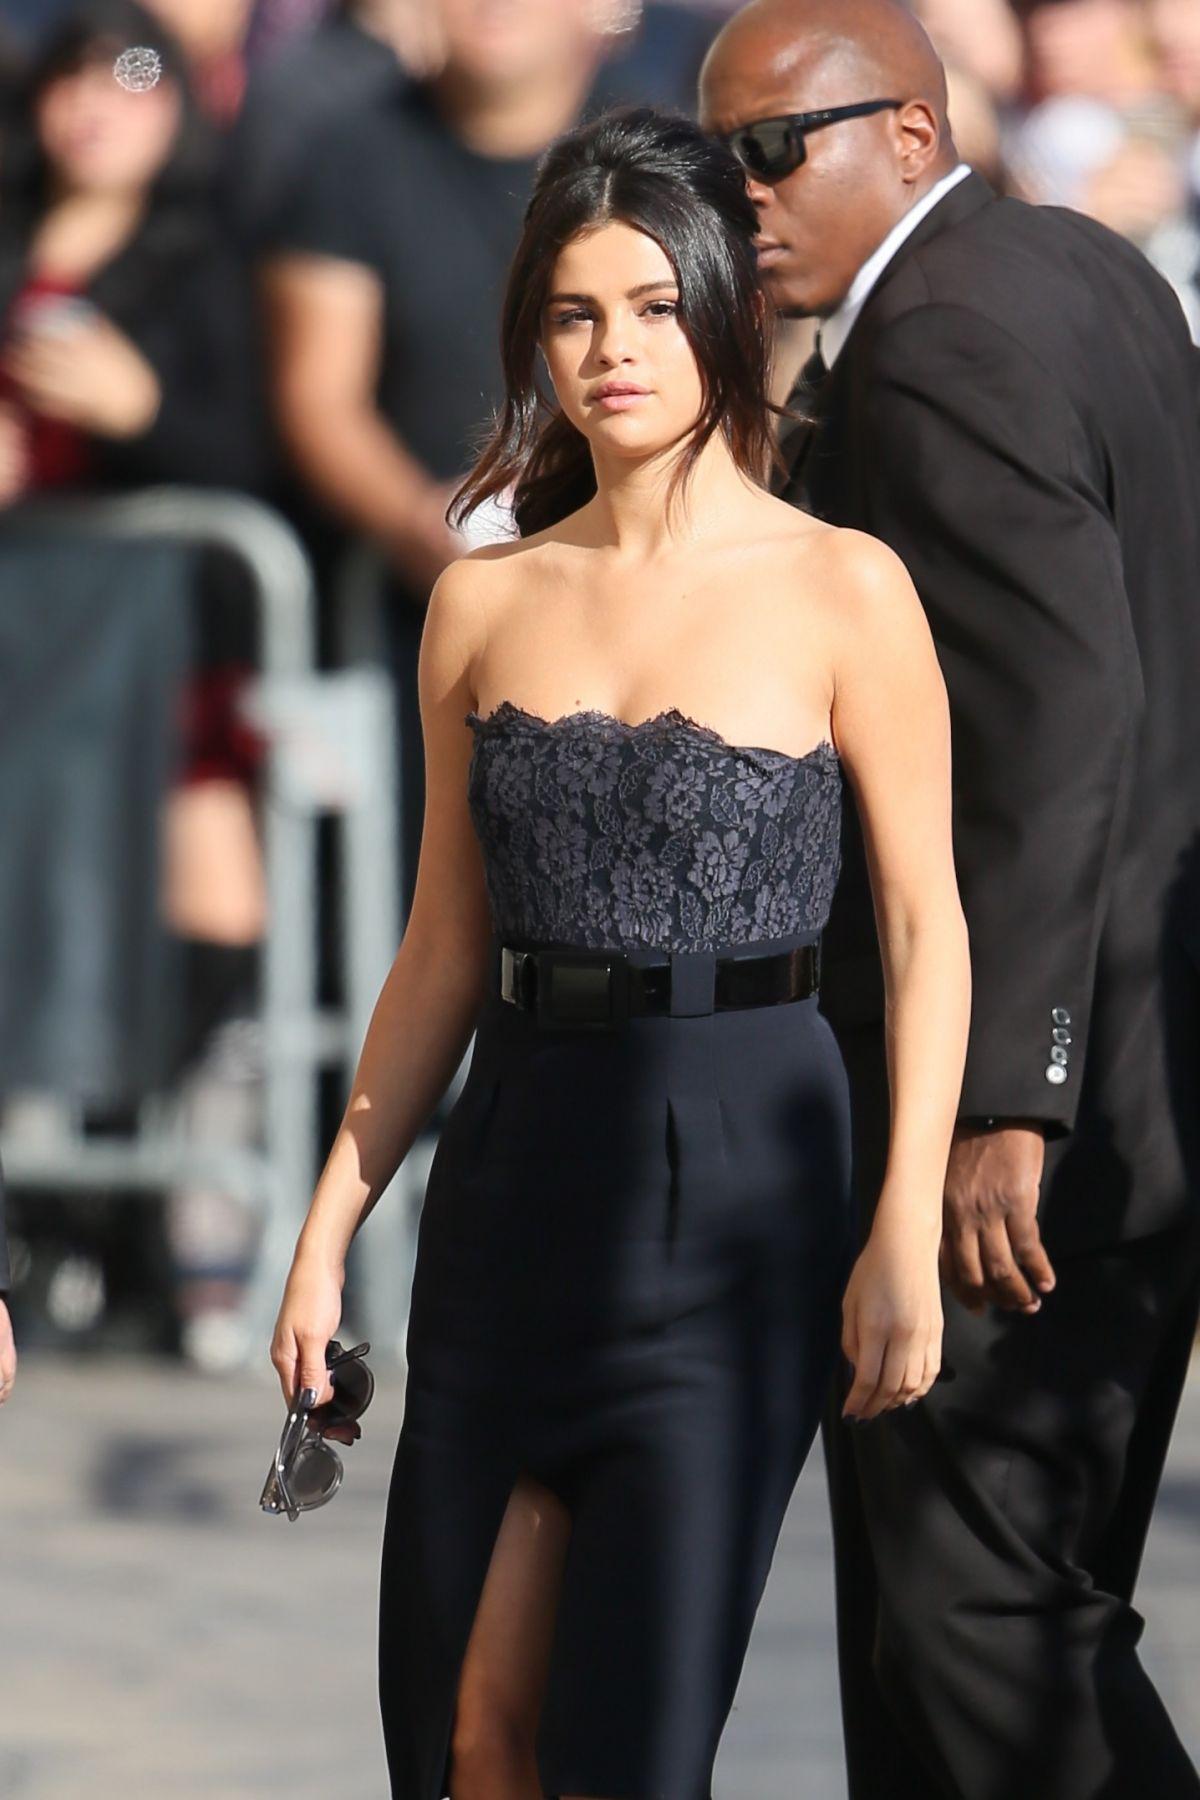 SELENA GOMEZ Arrives at Jimmy Kimmel Live in Hollywood 1510